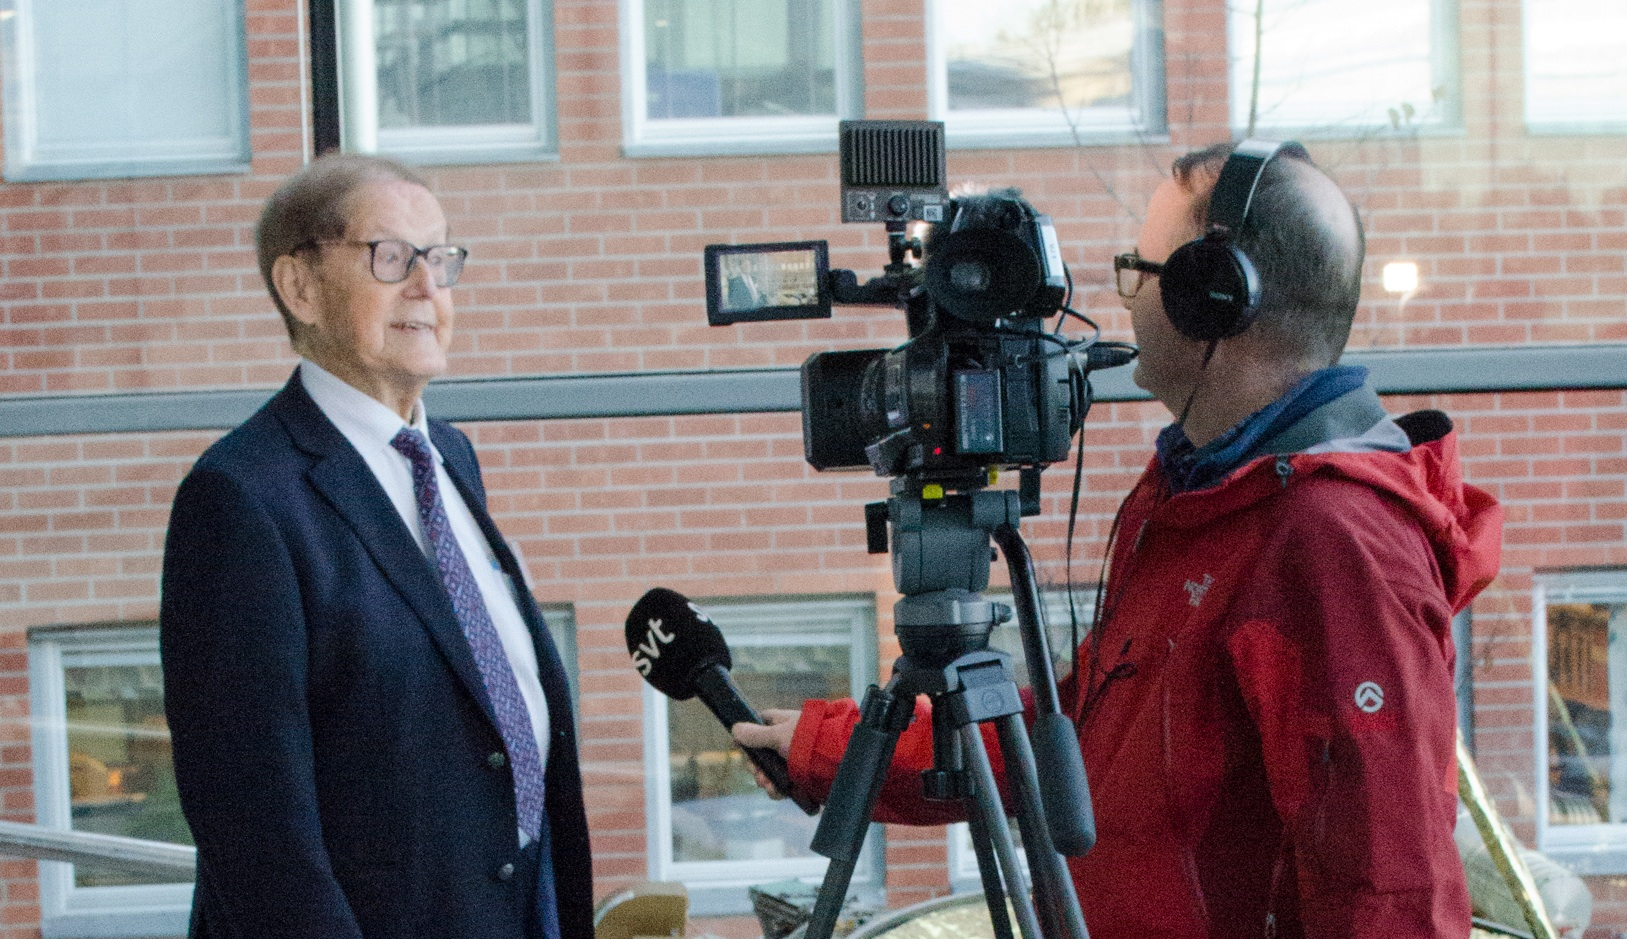 Bengt Hultqvist intervjuas av SVT:s Thommy Johansson (Foto: Rick McGregor, IRF)